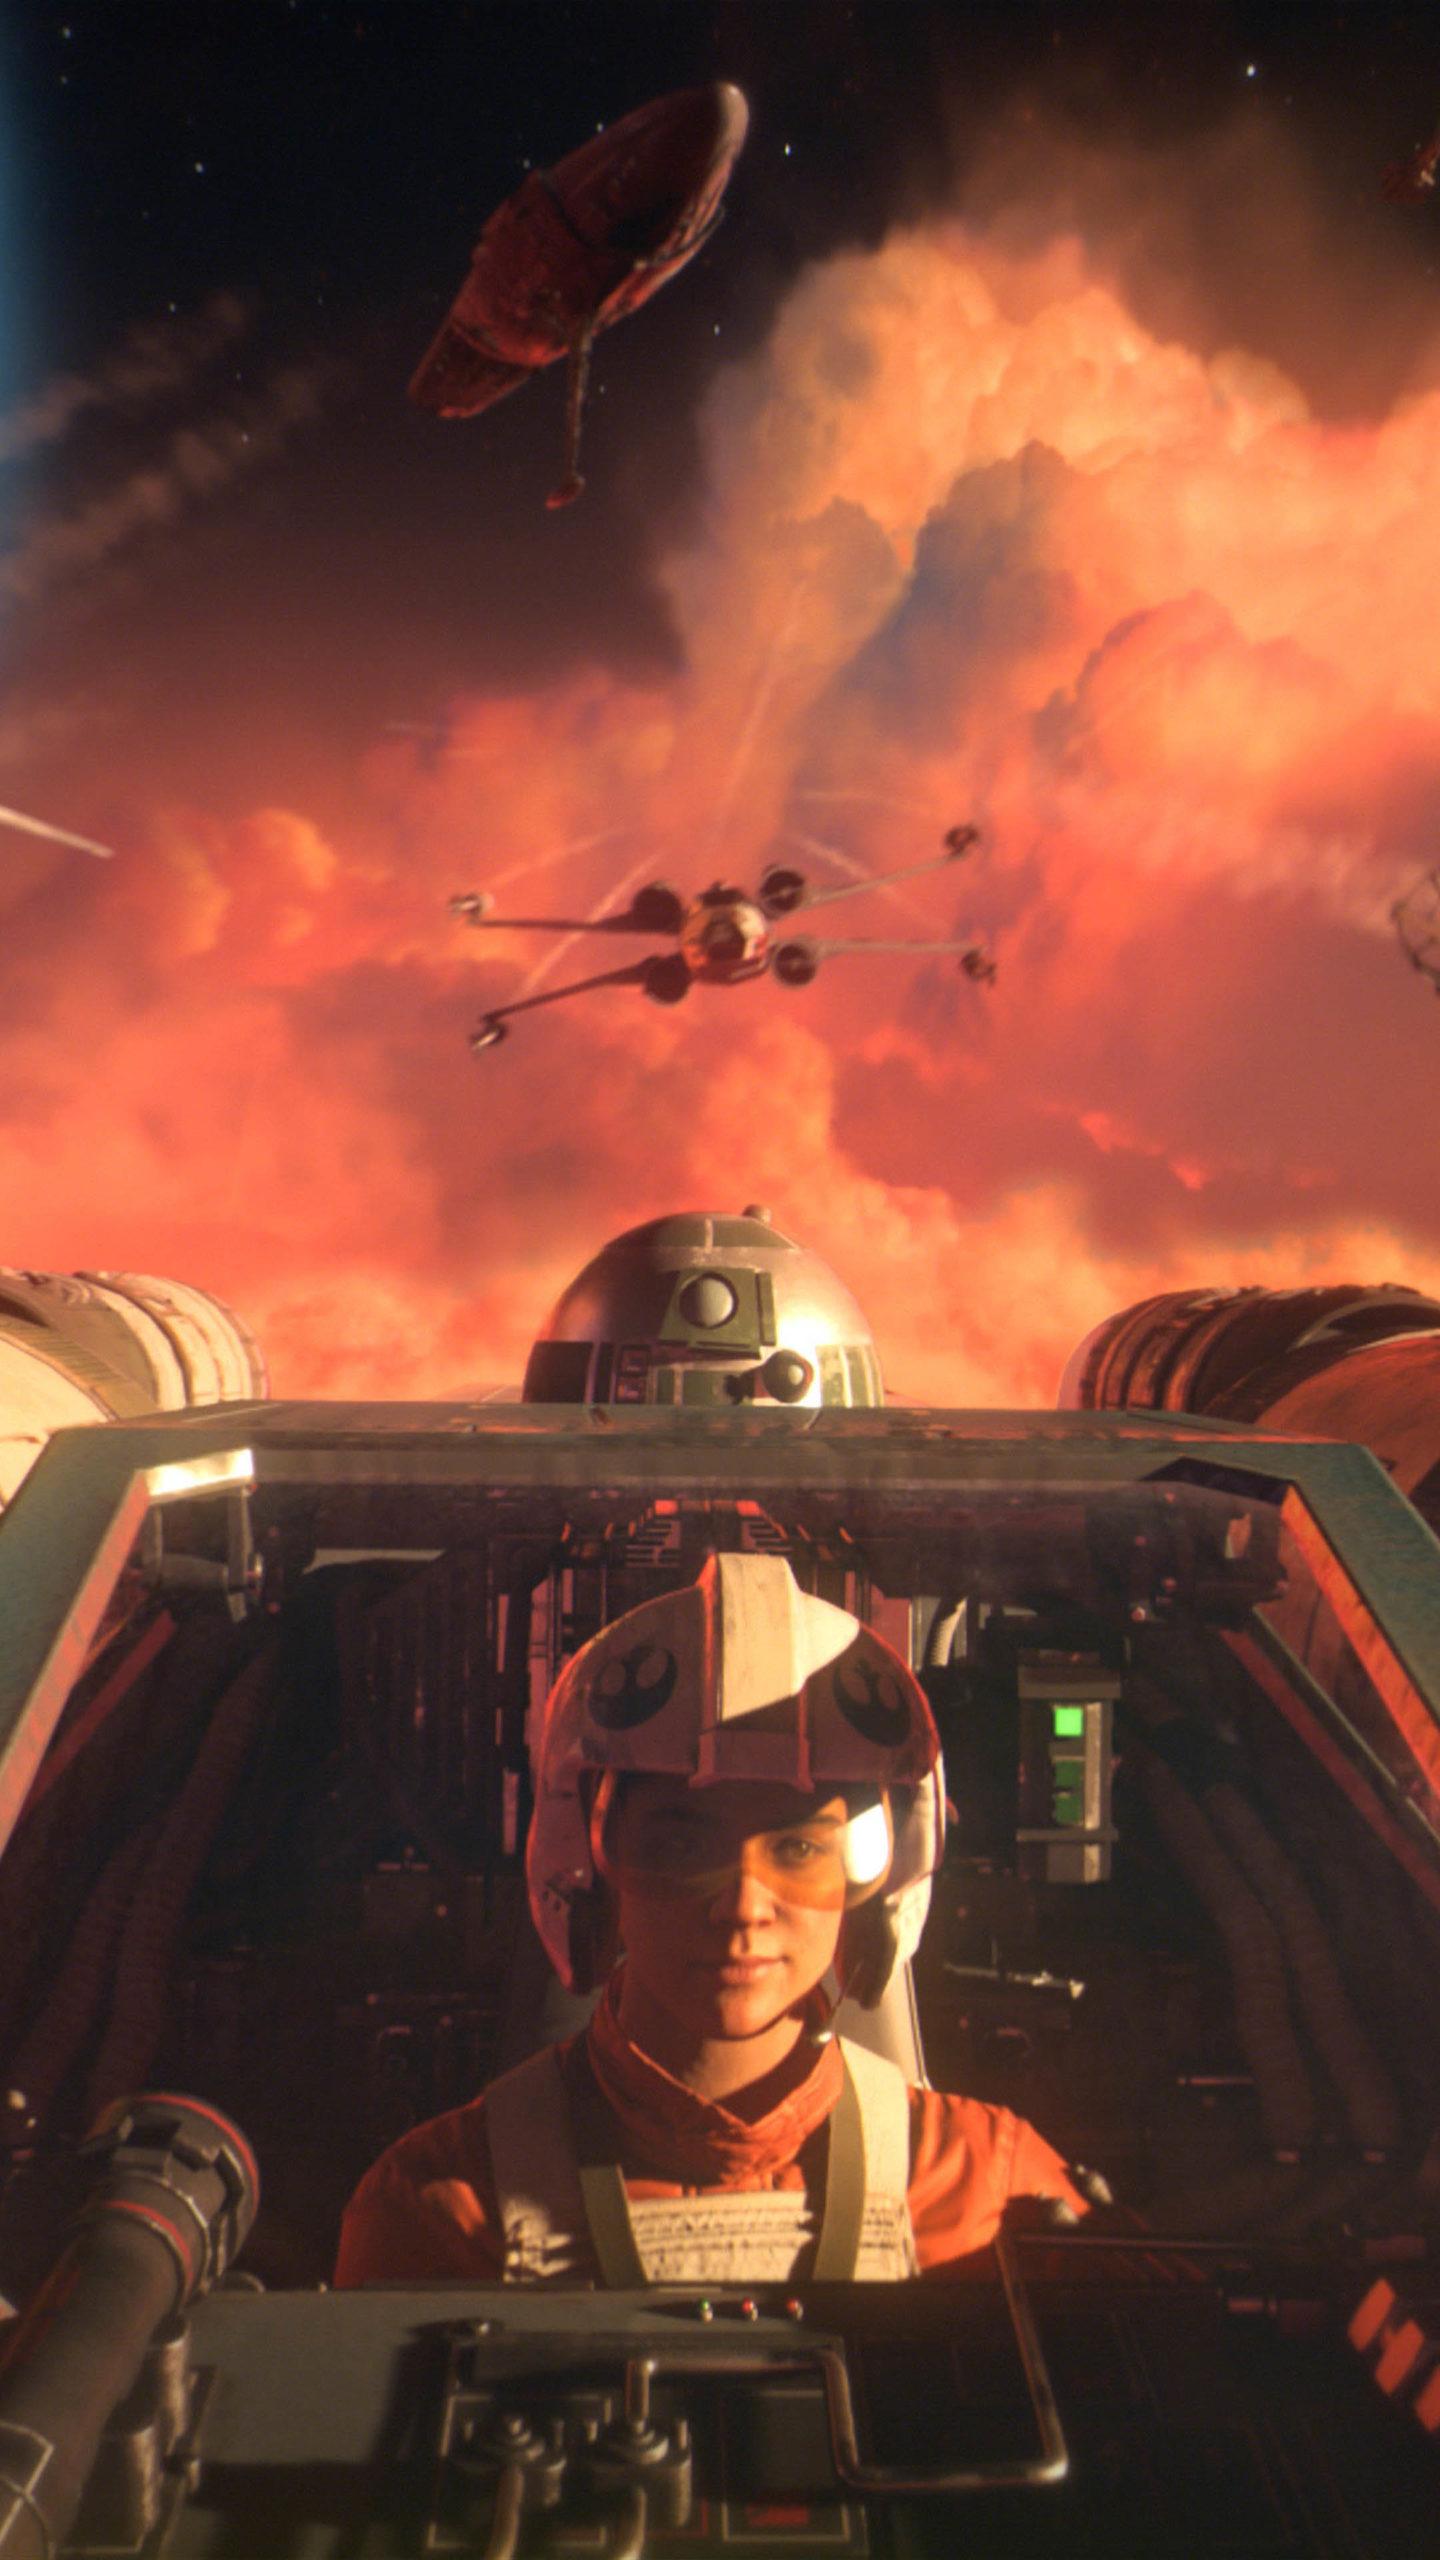 Star Wars Squadrons Battle 4k Ultra Hd Mobile Wallpaper